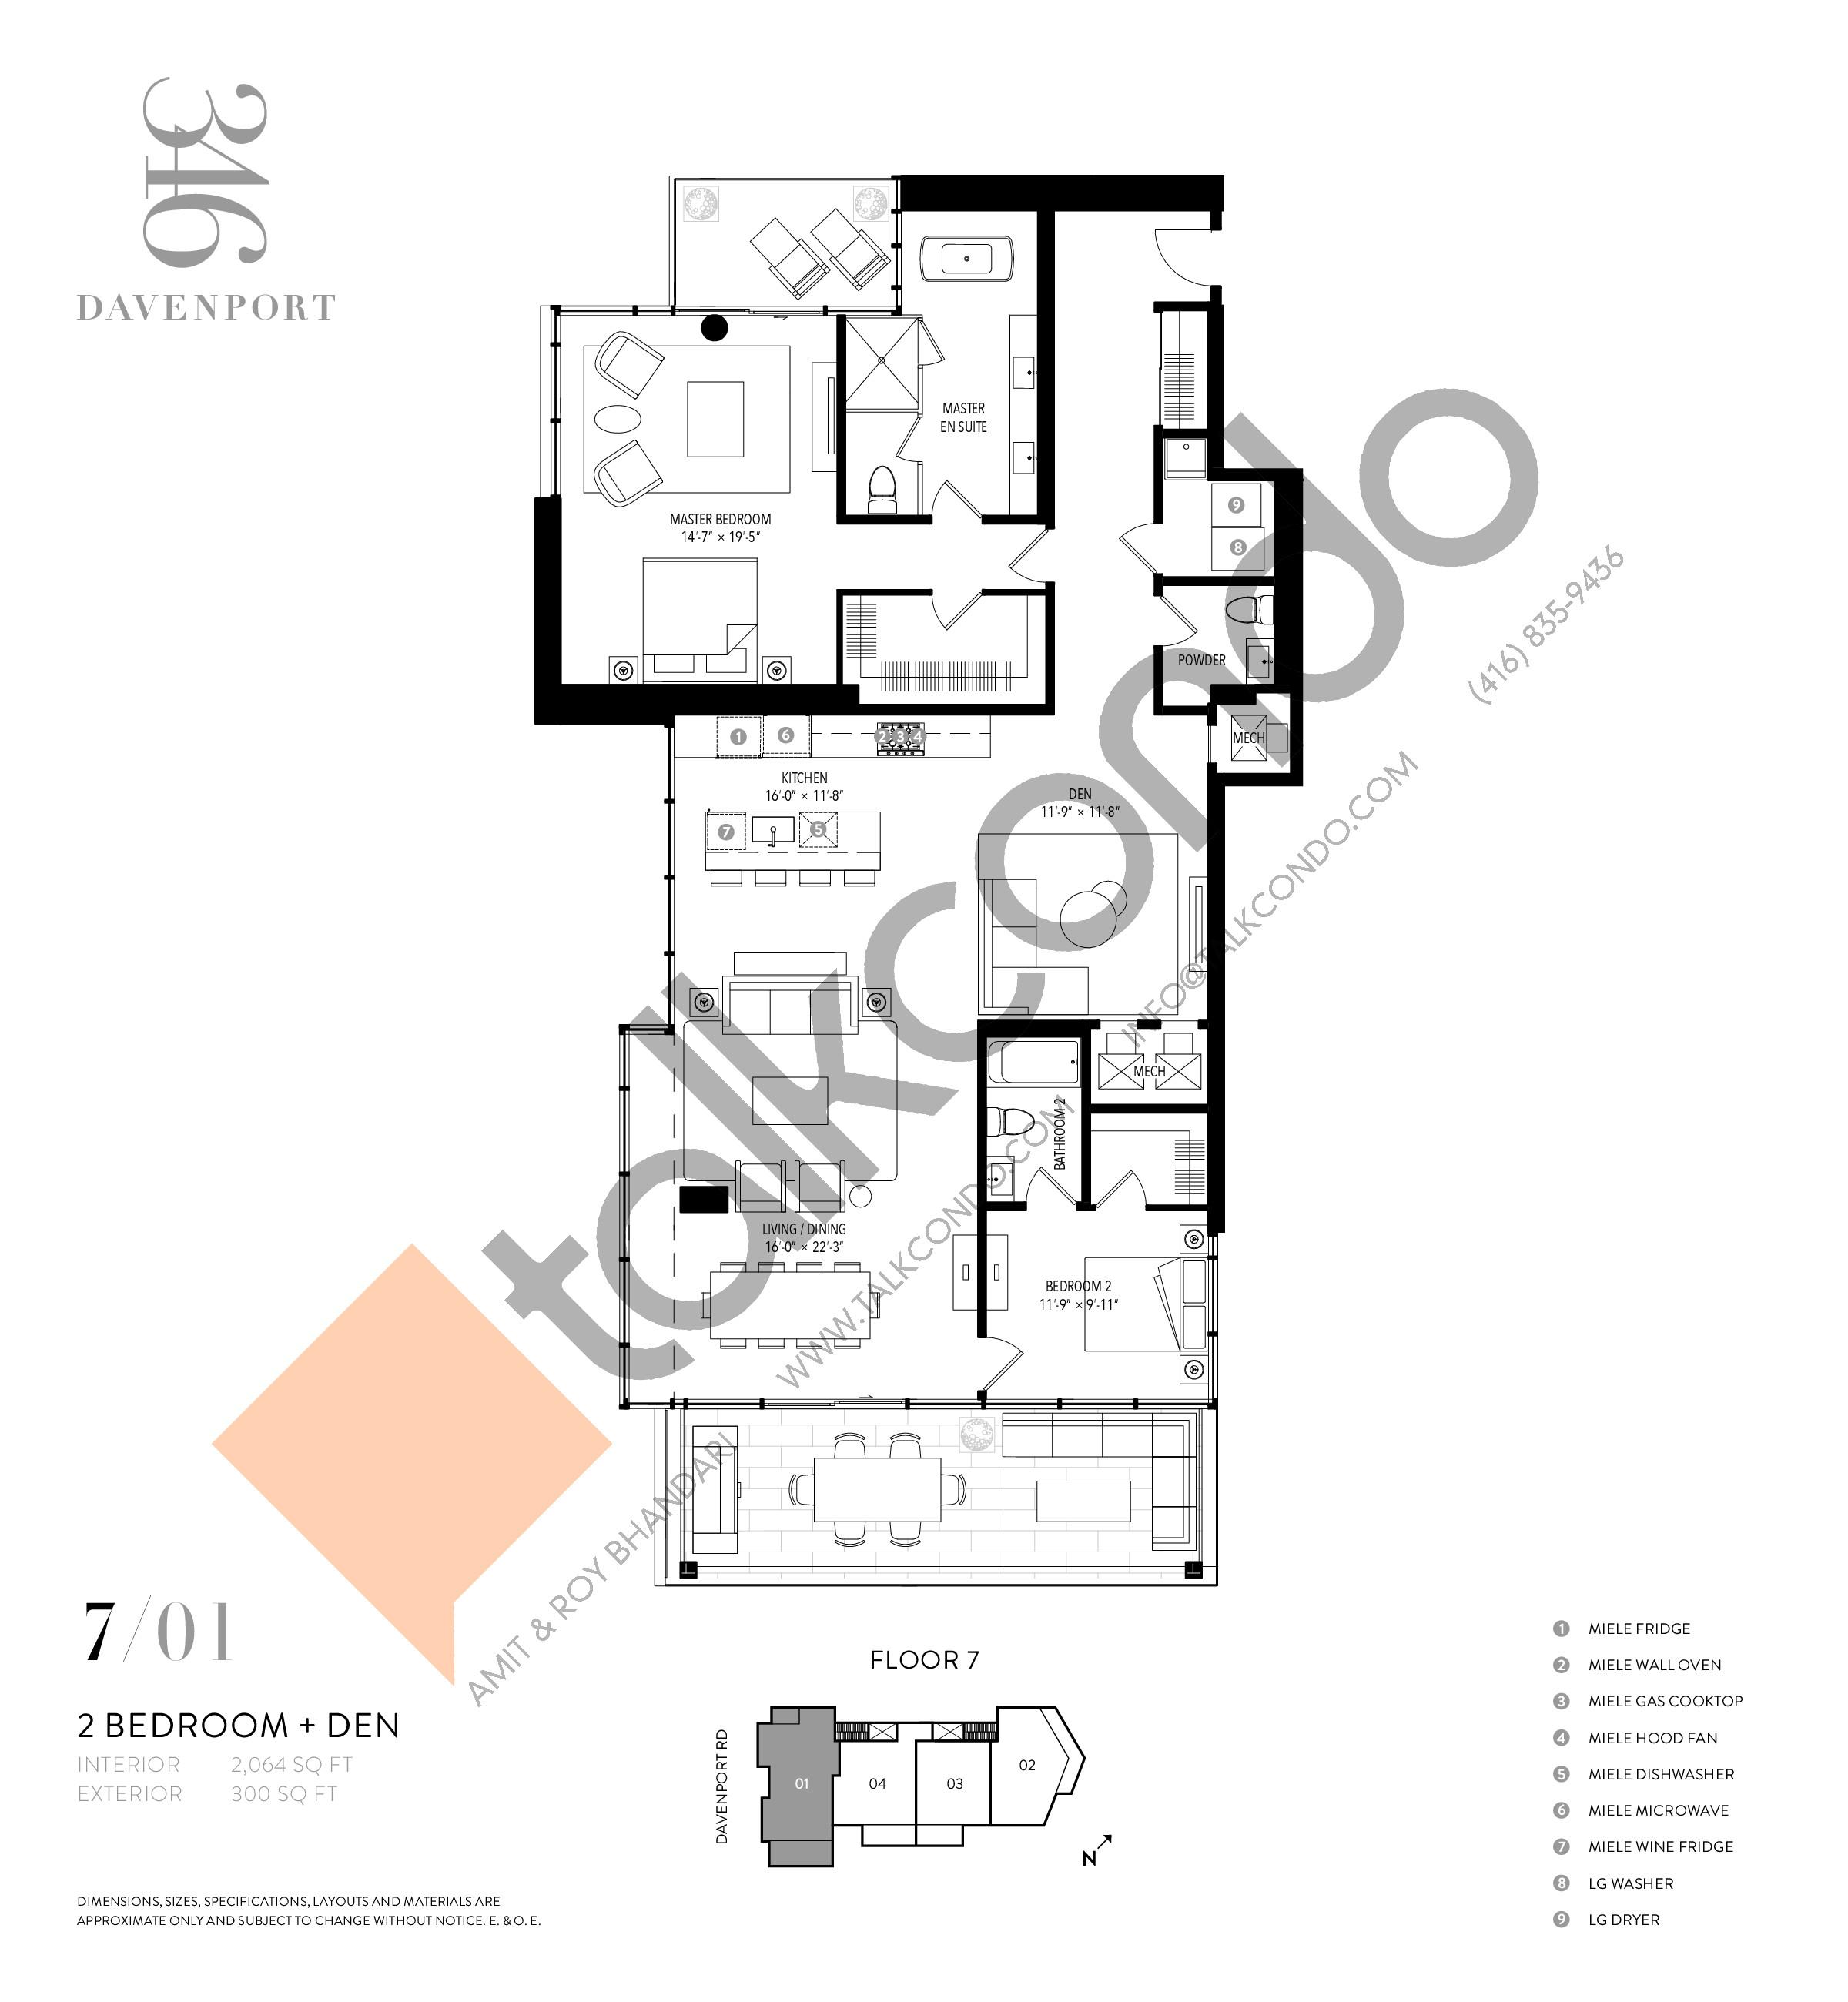 701 Floor Plan at 346 Davenport Condos - 2064 sq.ft